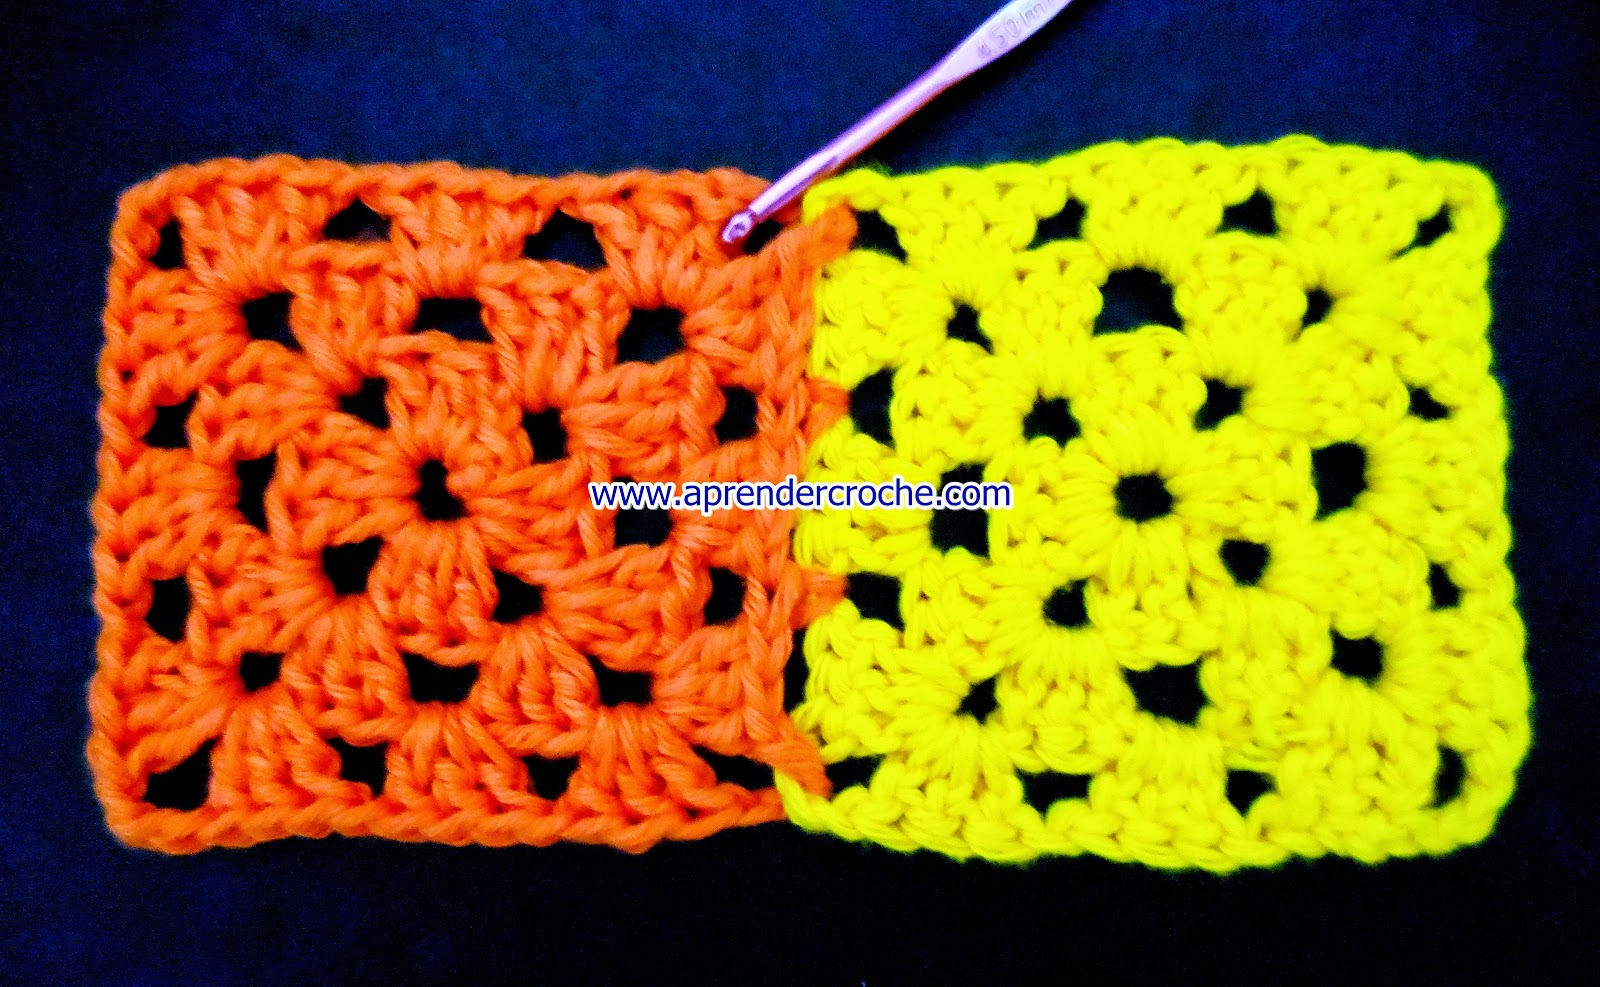 aprender croche square quadrado perfeito cenoura amarelo emenda perfeita edinir-croche loja frete gratis youtube facebook